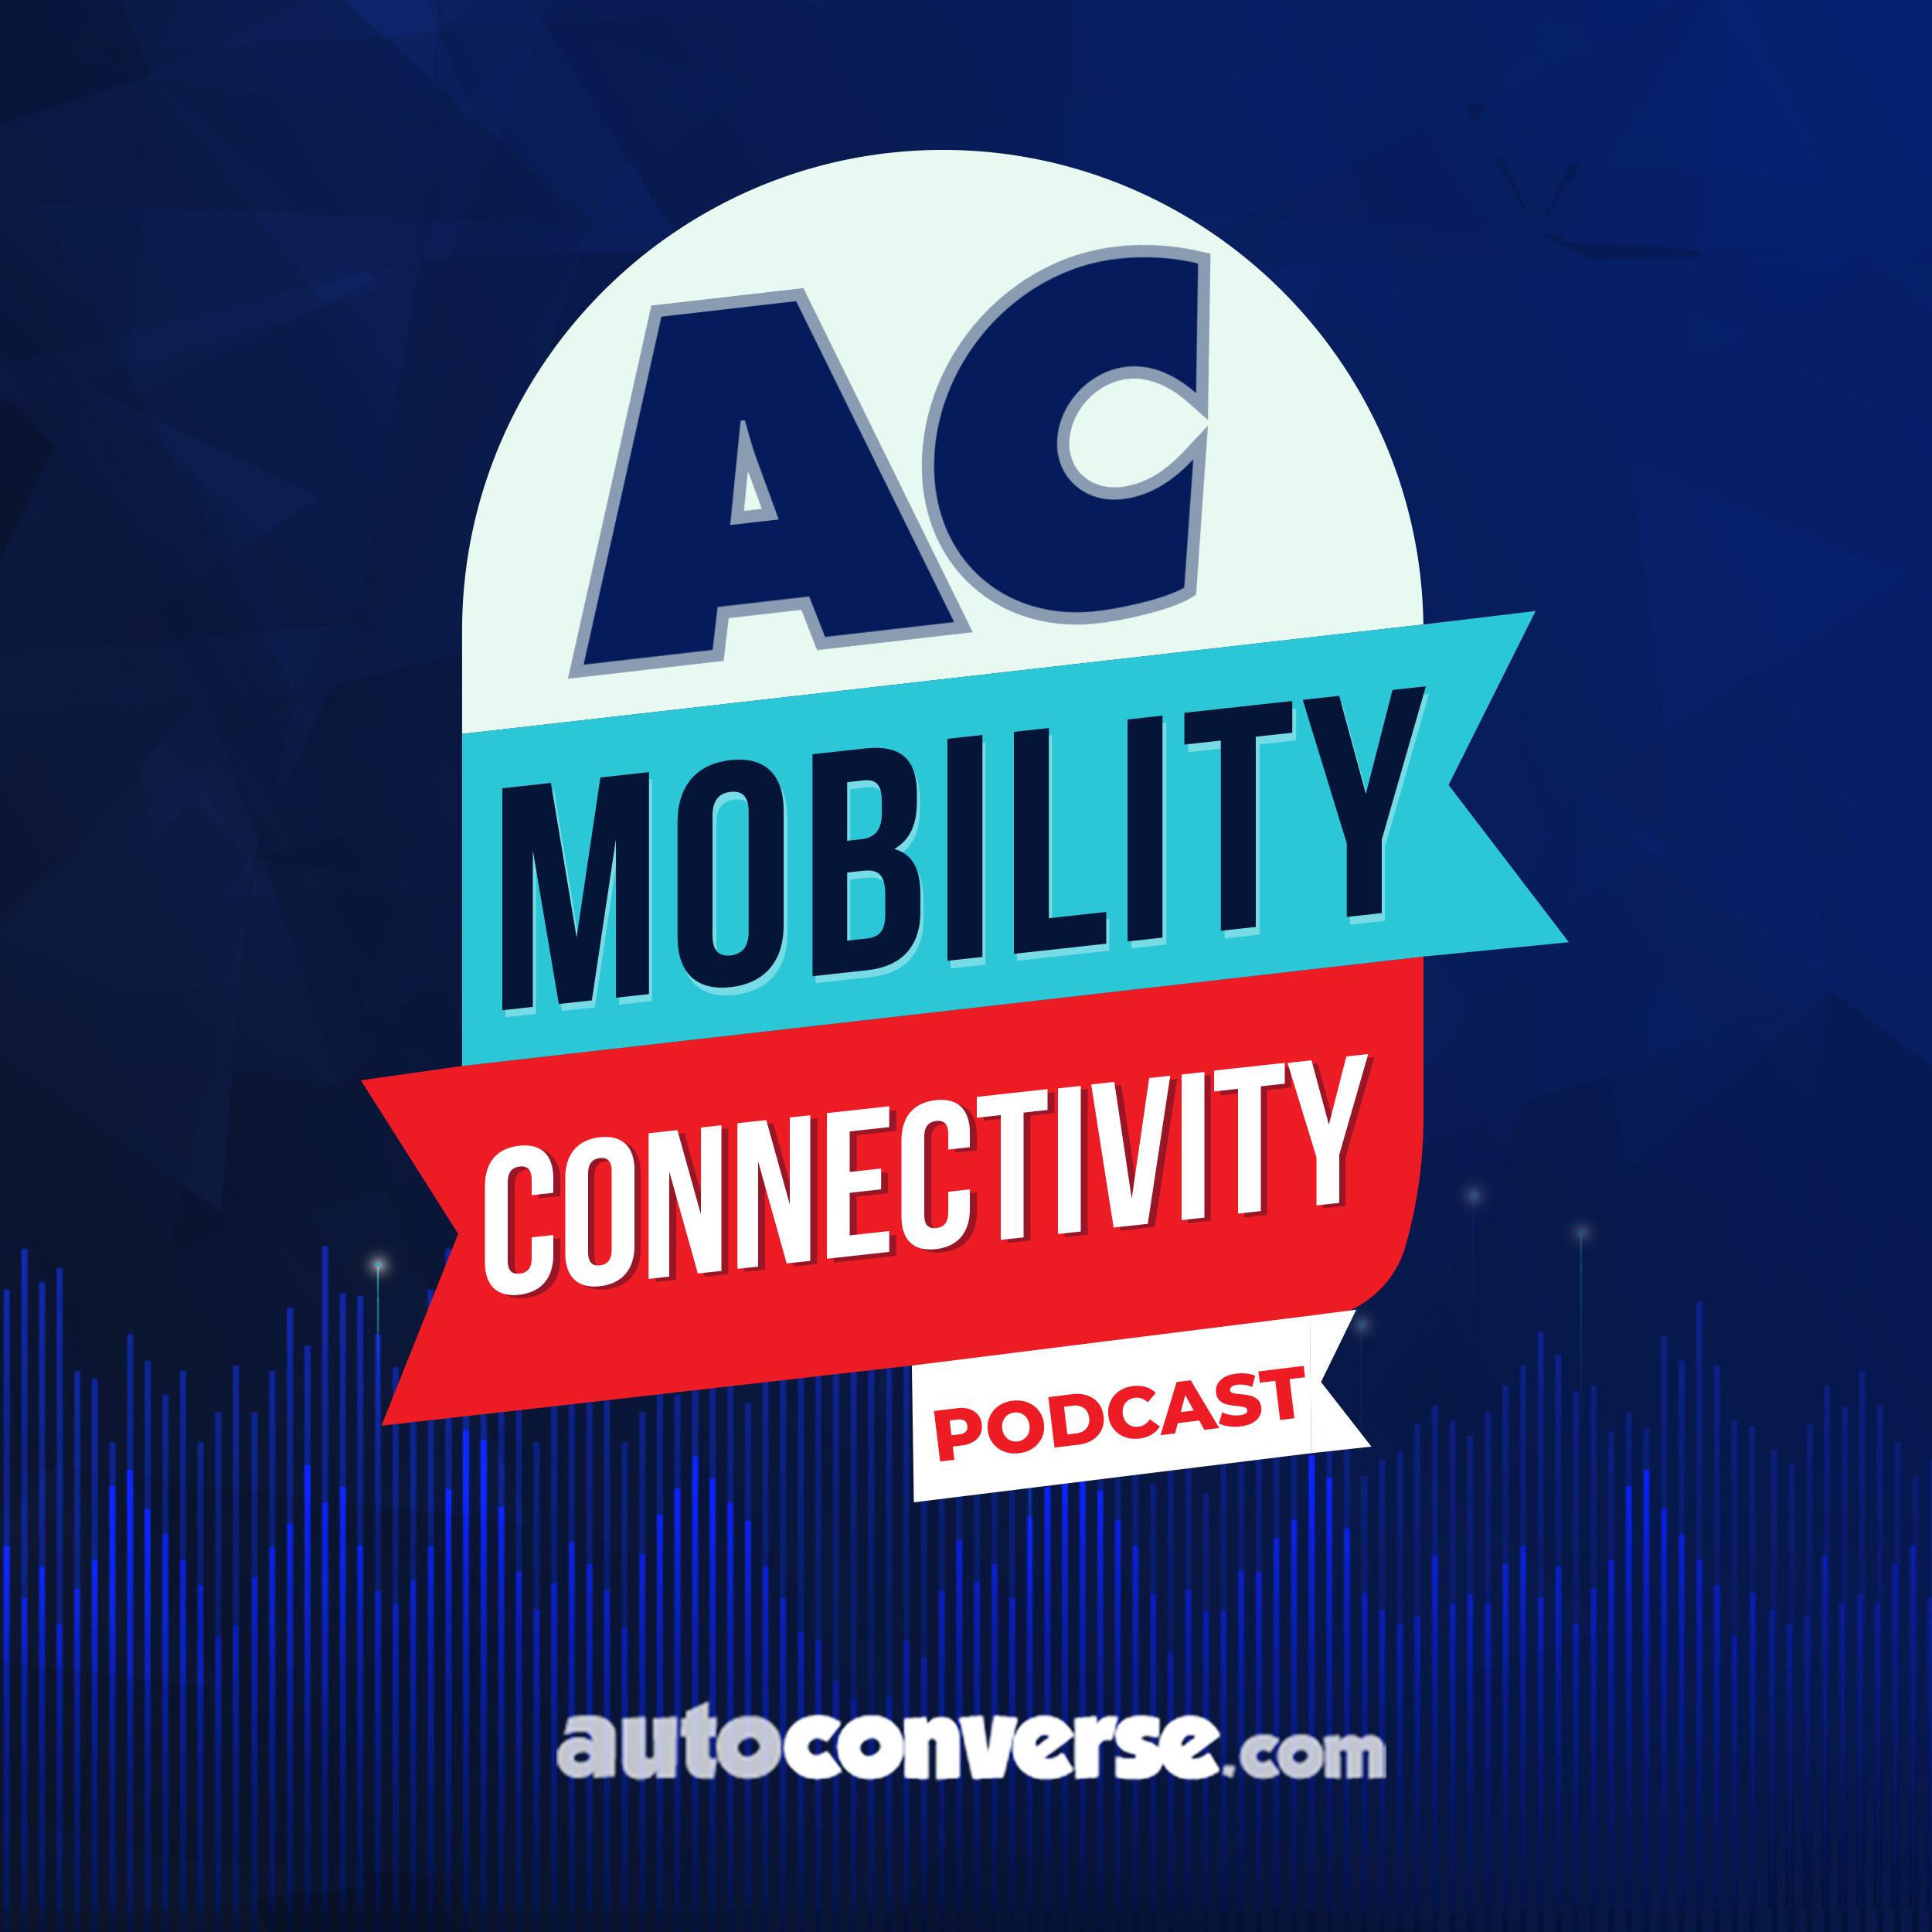 AutoConverse Mobility & Connectivity Podcast